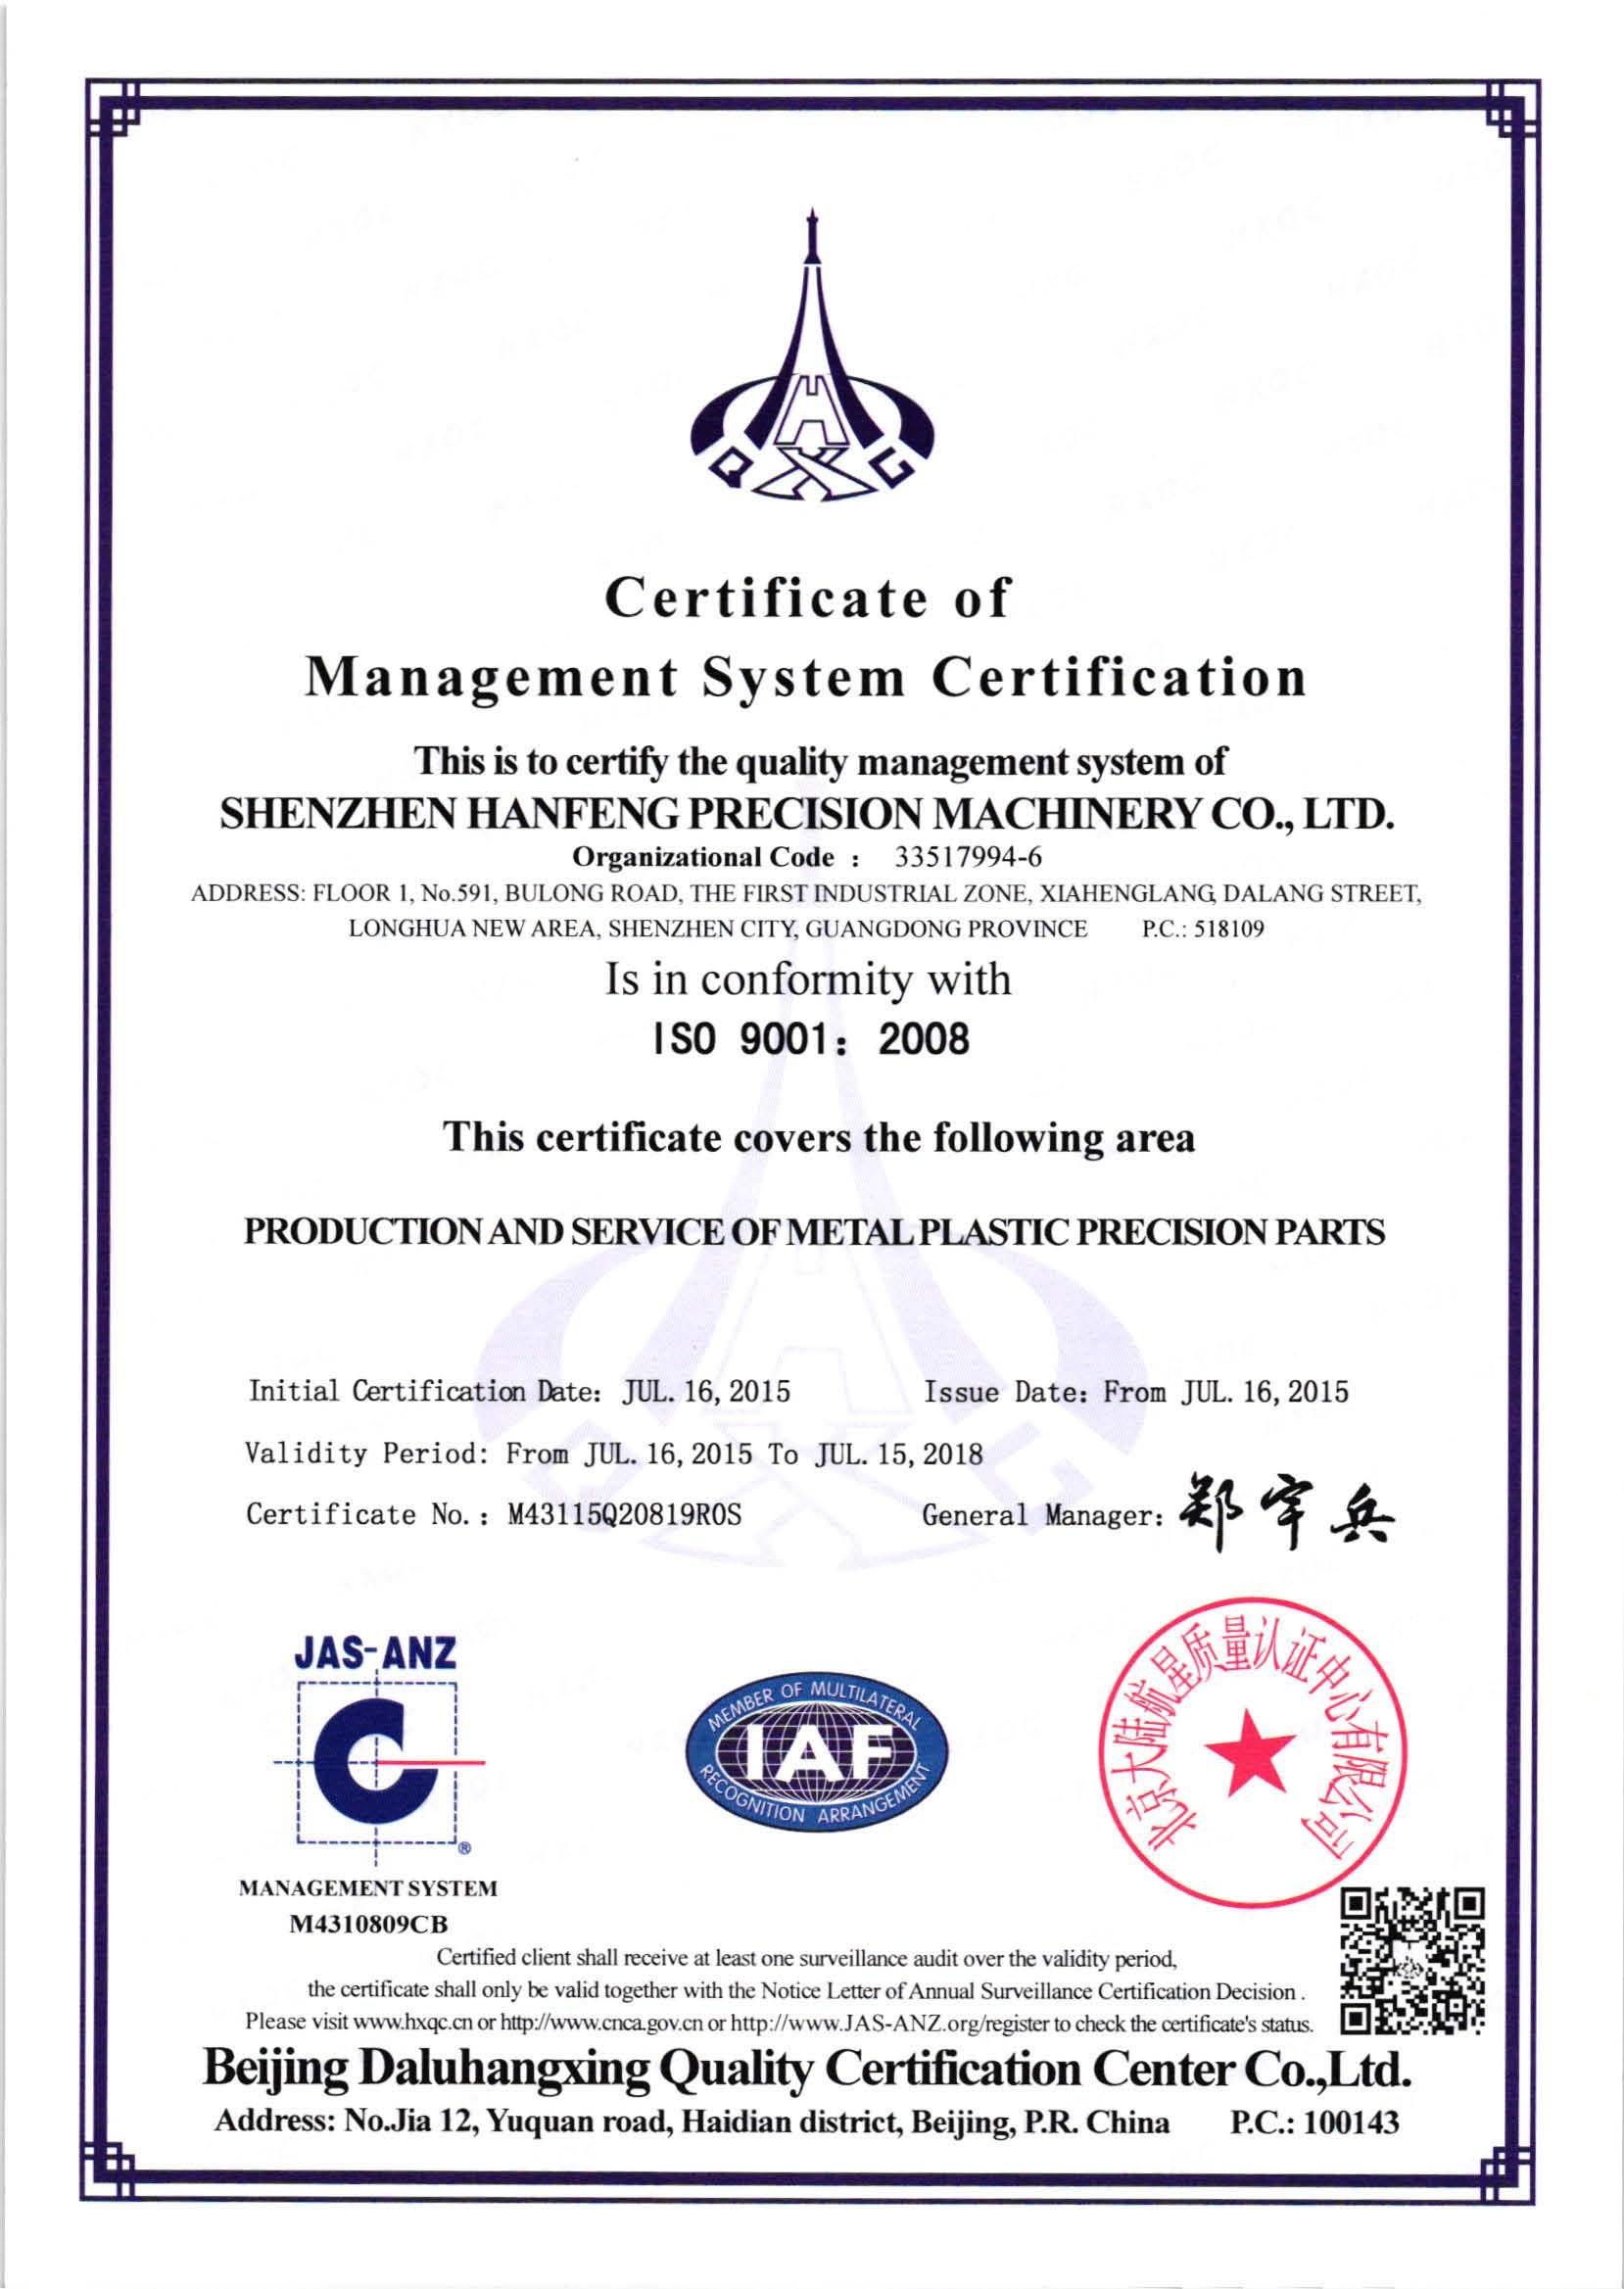 Shenzhen Hanfeng Precision Machinery Co Ltd Iso 9001 Certified